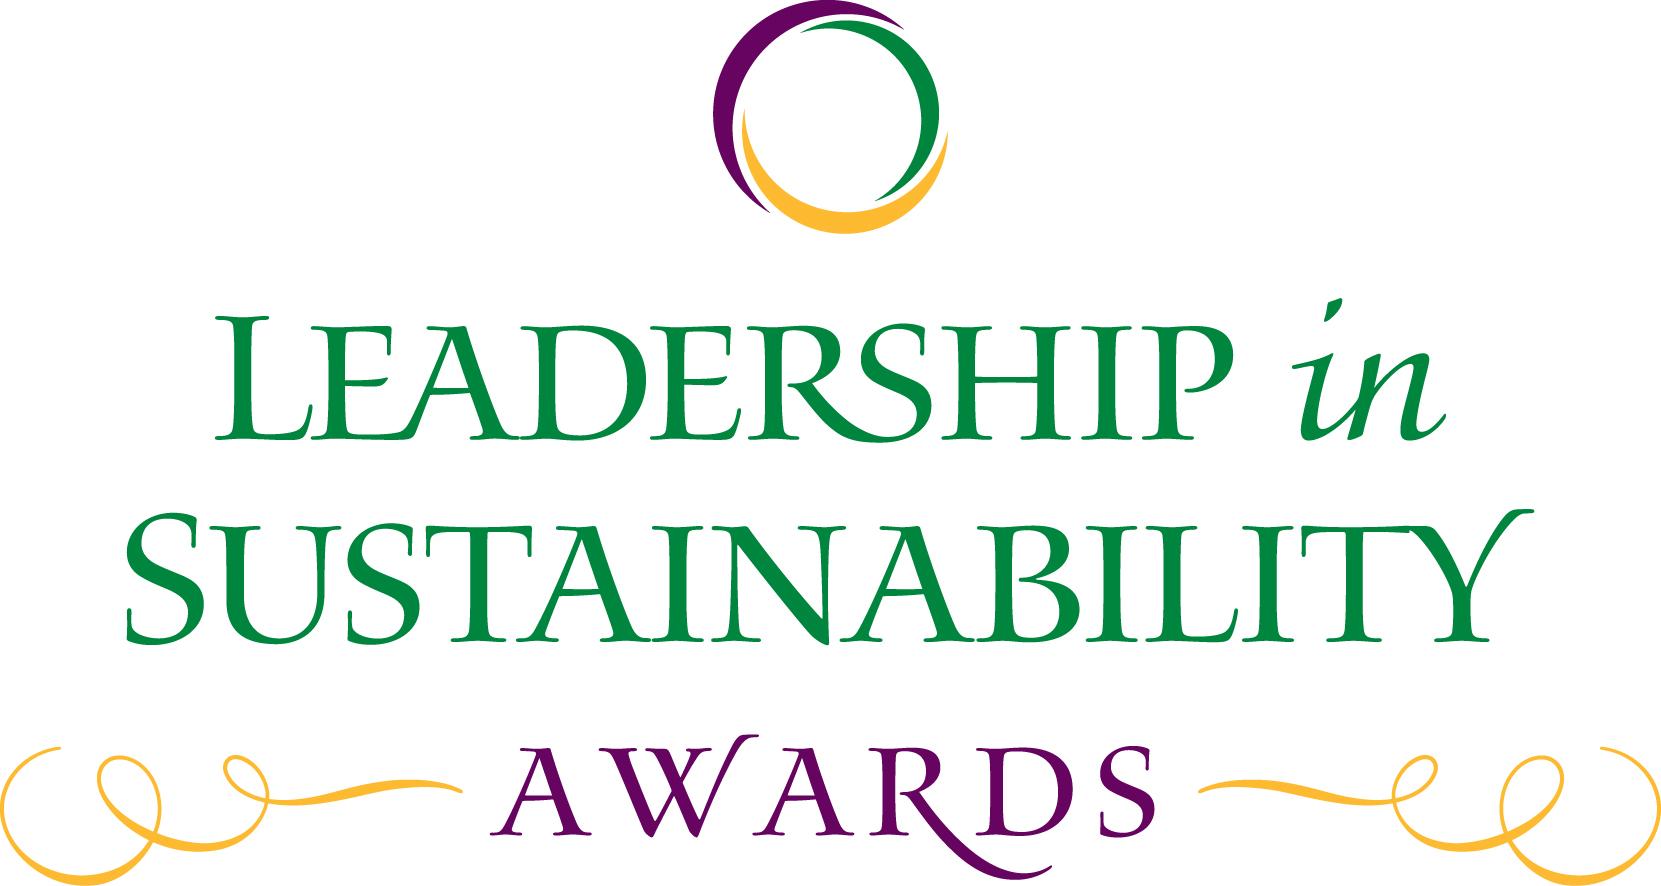 Leadership in Sustainability Awards logo